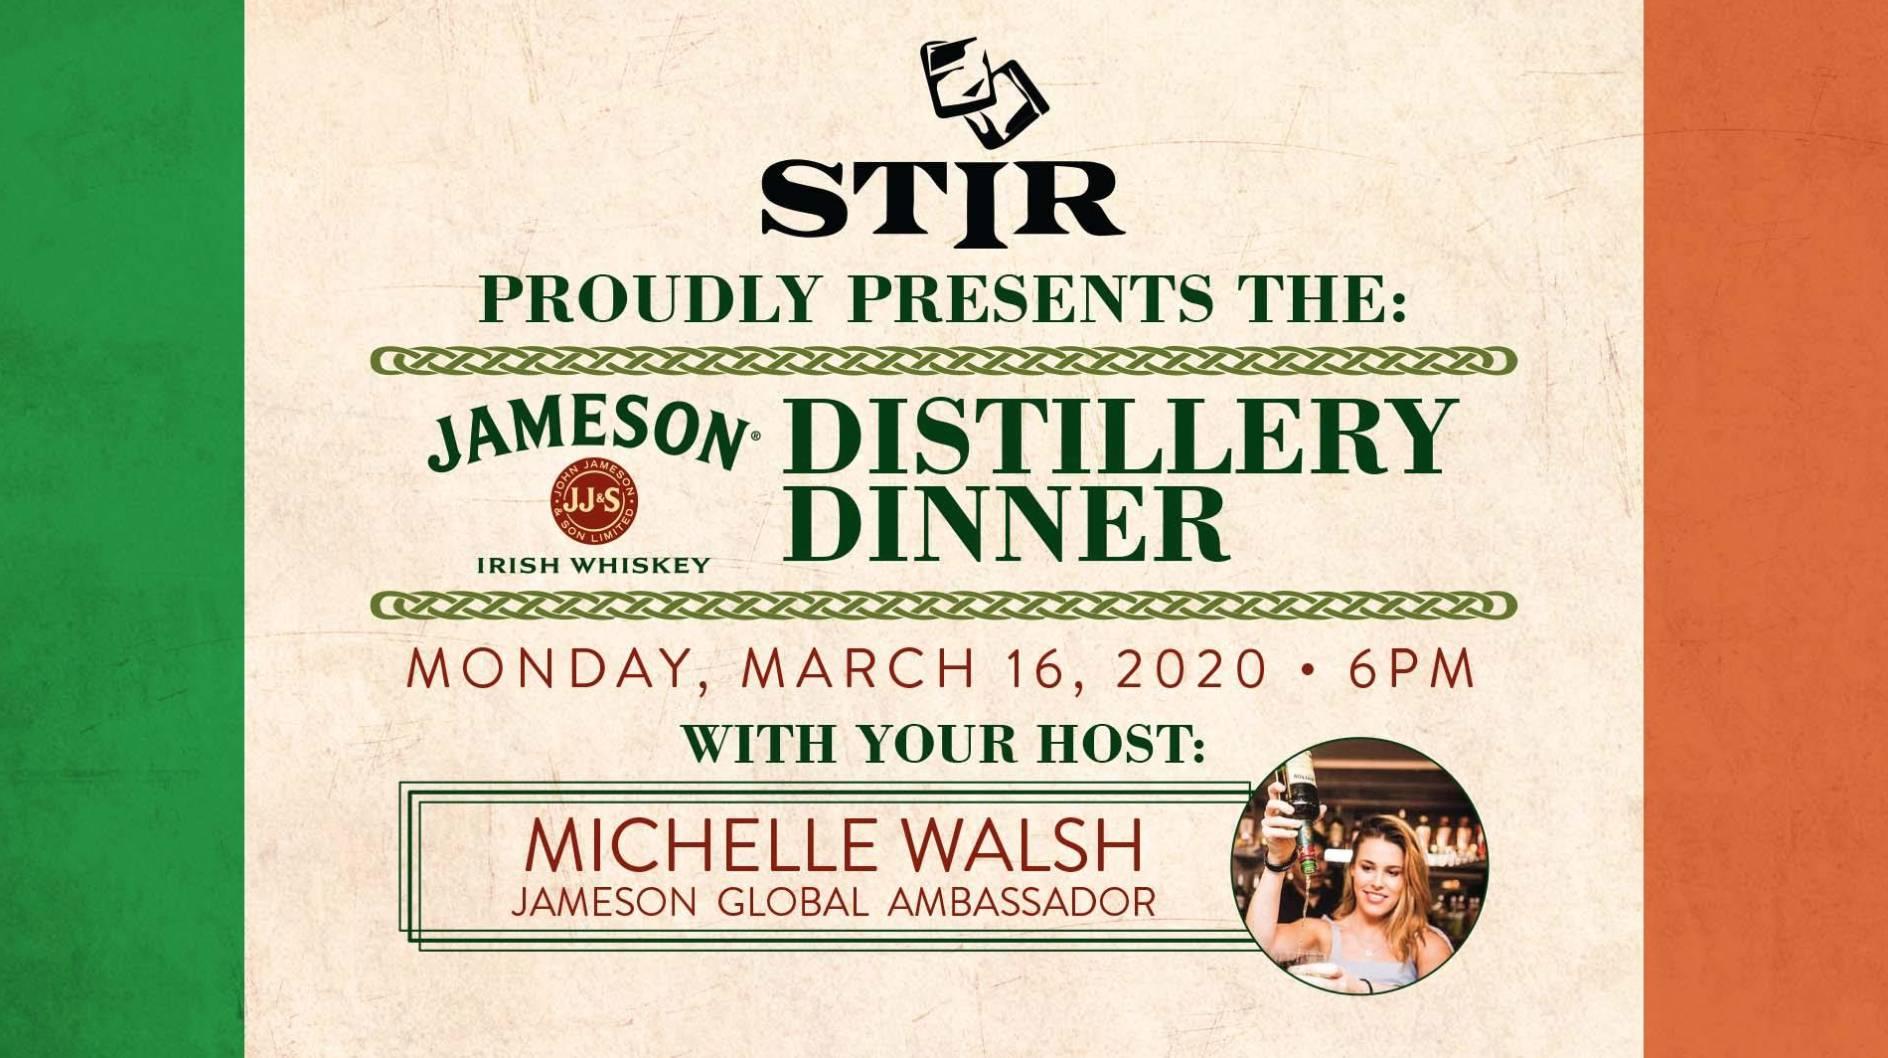 The Jameson Distillery Dinner